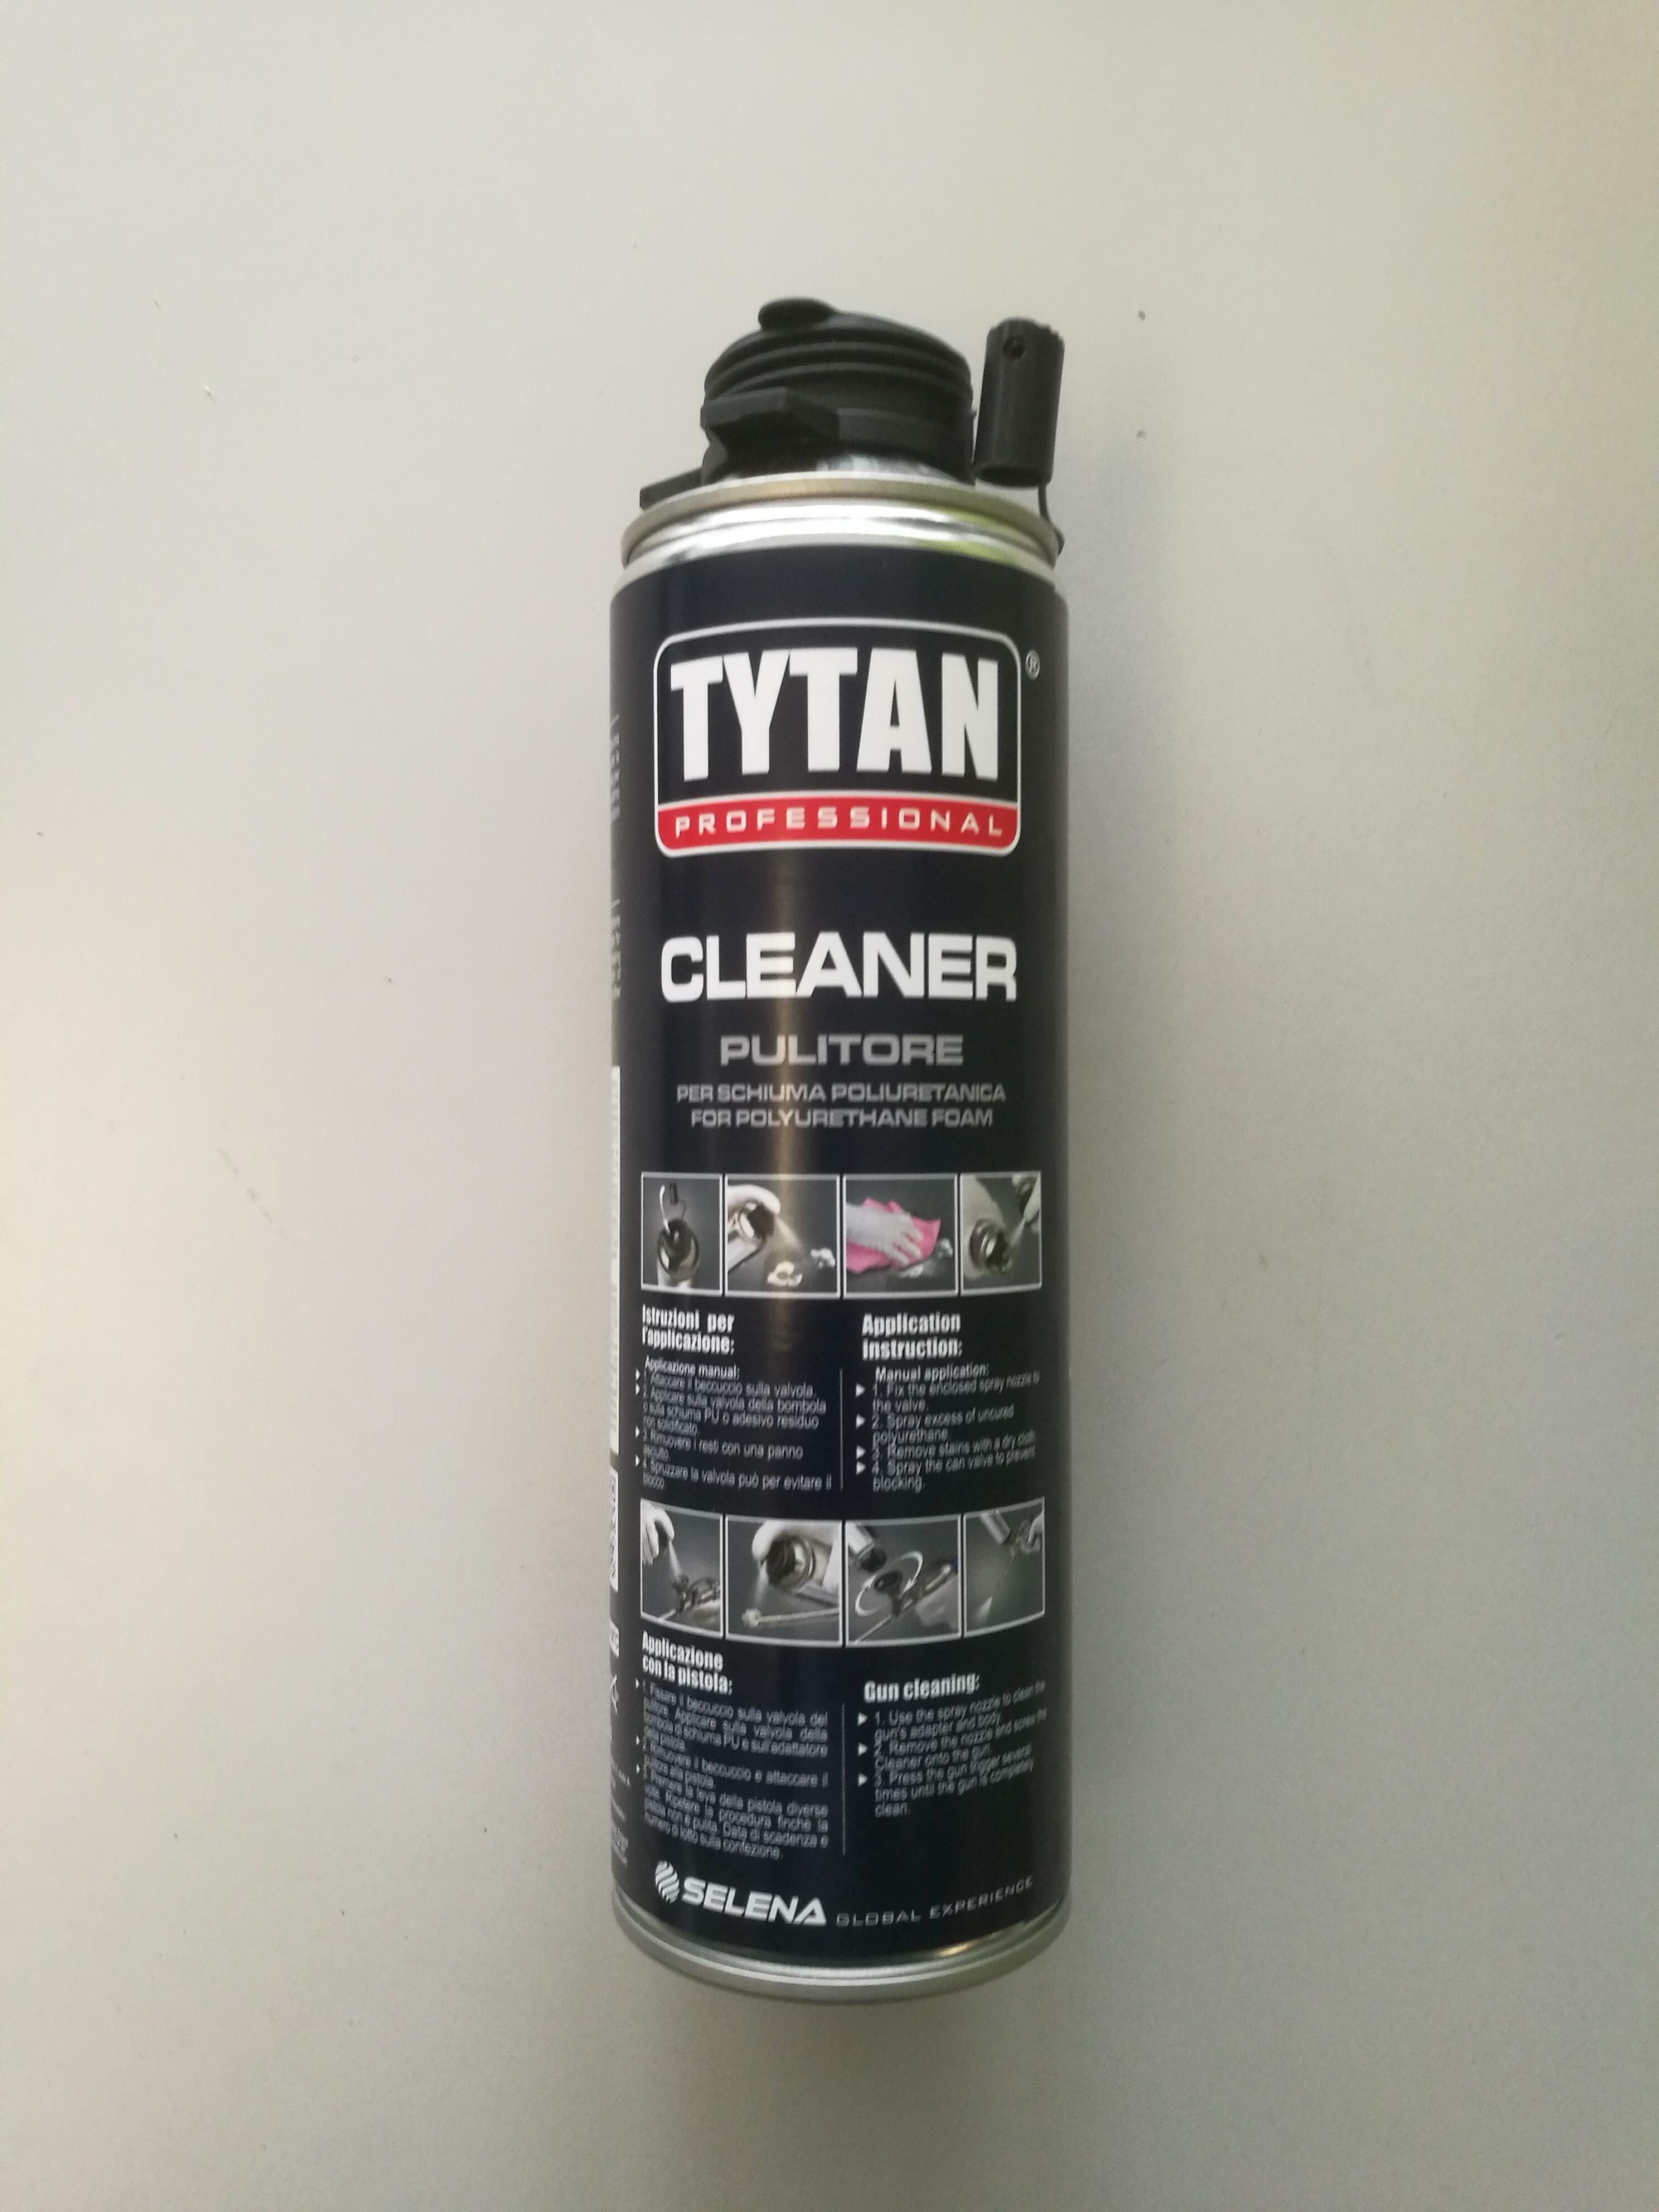 tytan professional tytan professional pulitore per schiuma poliuretanica 500 ml